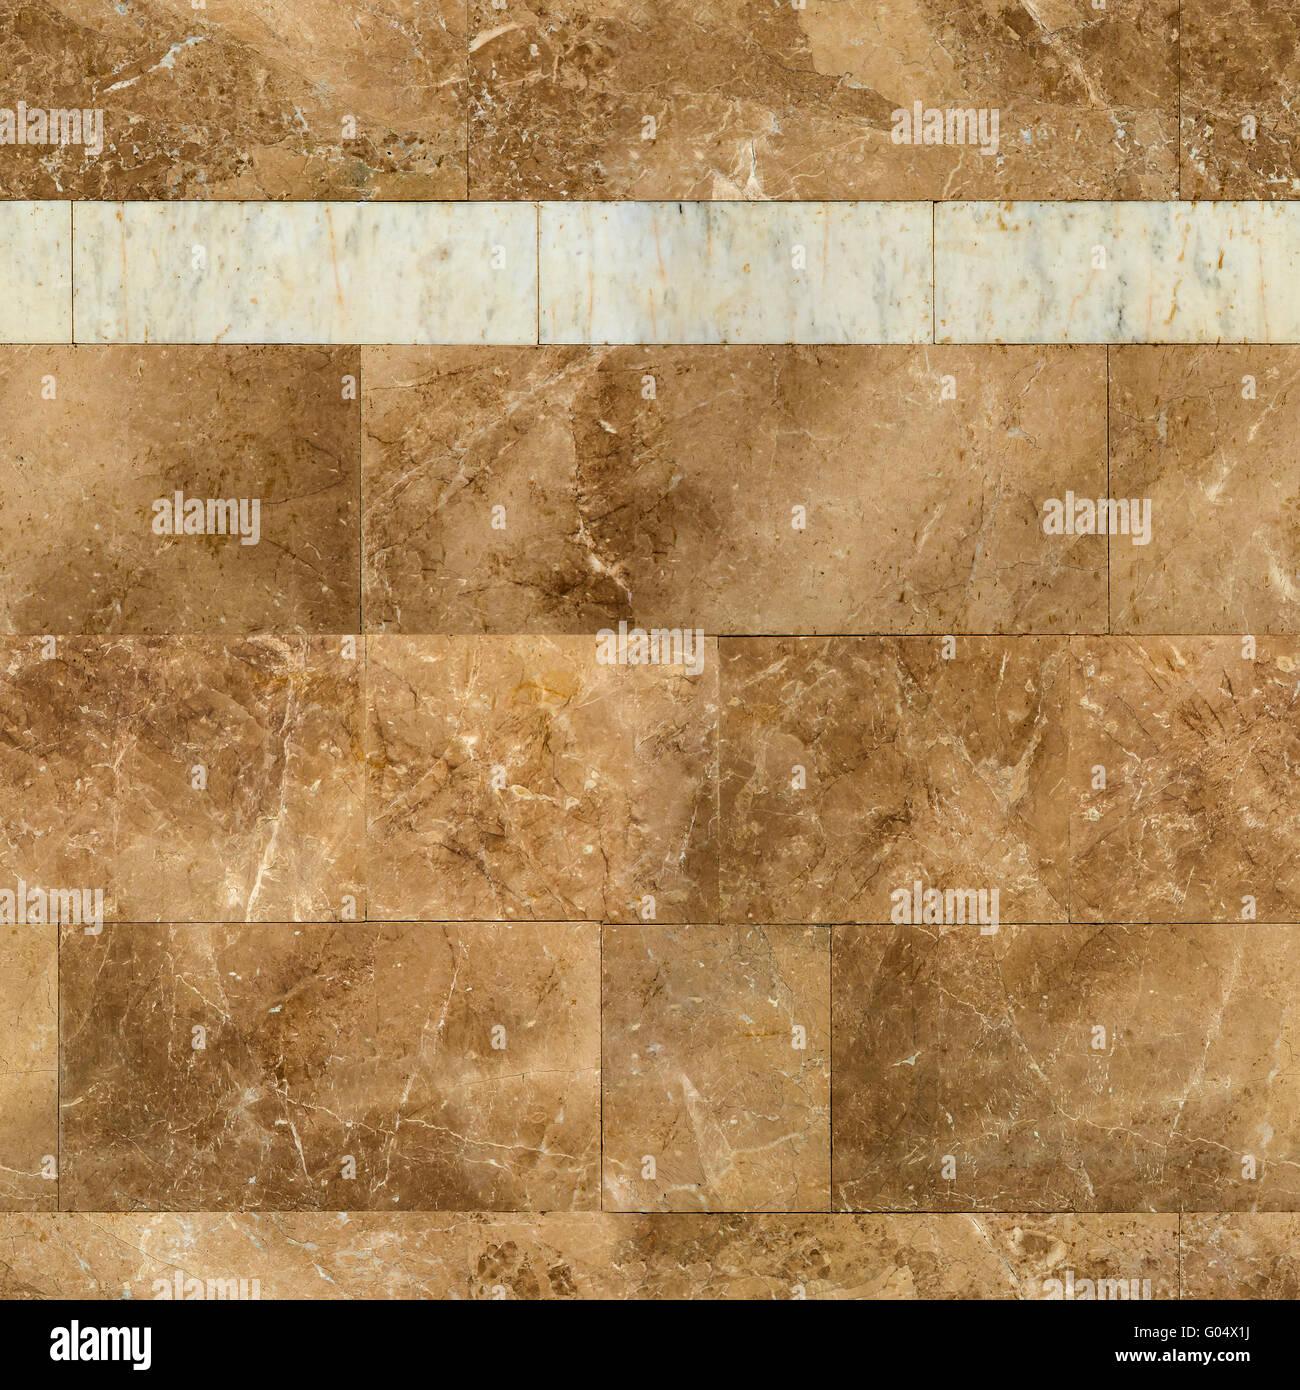 Marble Brick Wall Seamless Texture Big Resolution Tile Horizontal Stock Photo Alamy